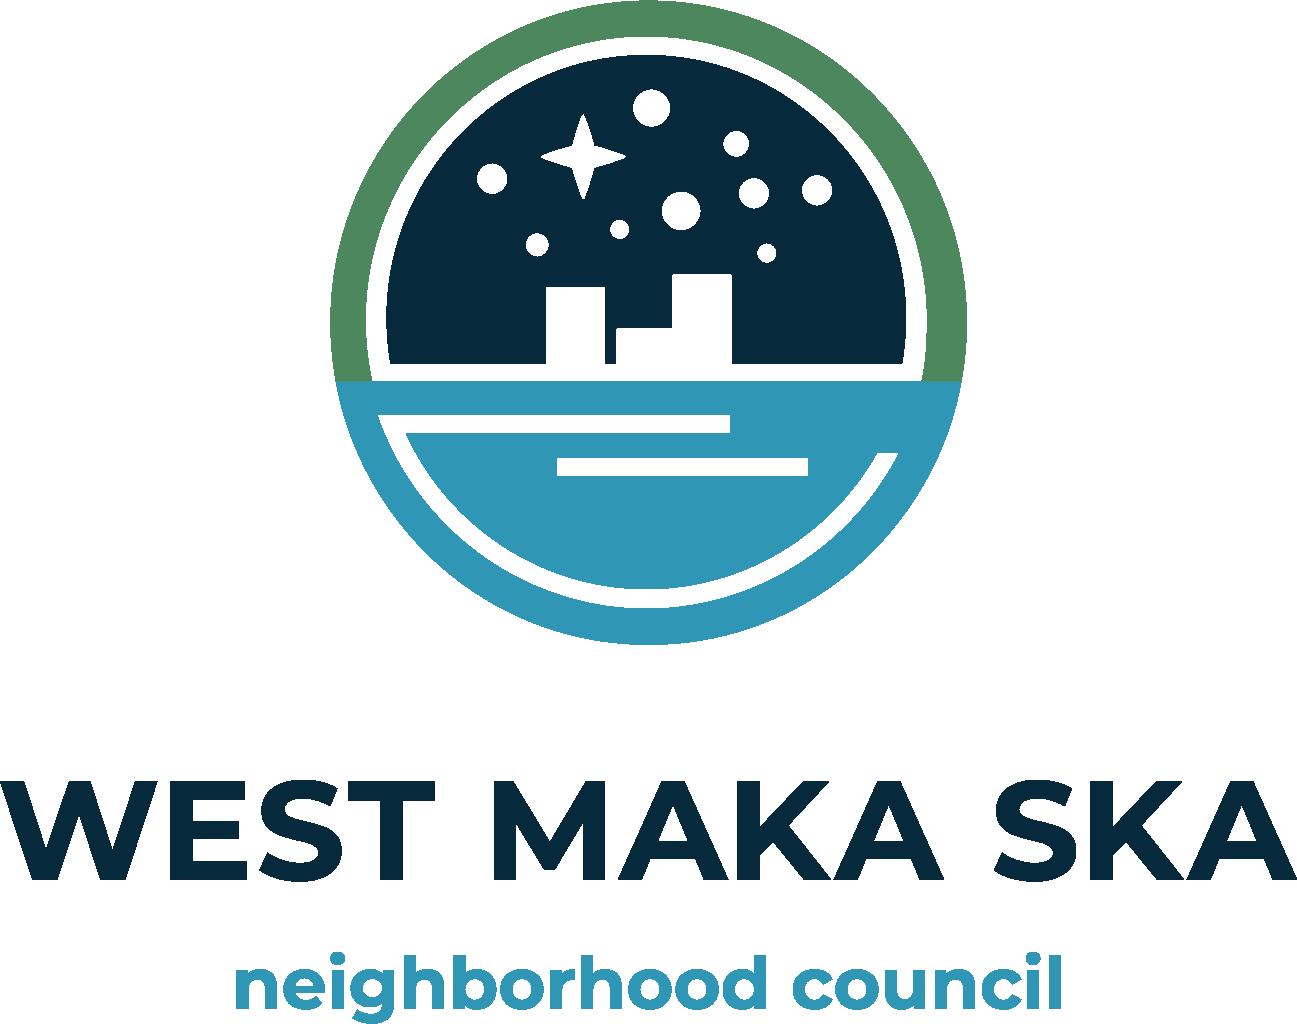 West Maka Ska Neighborhood Council